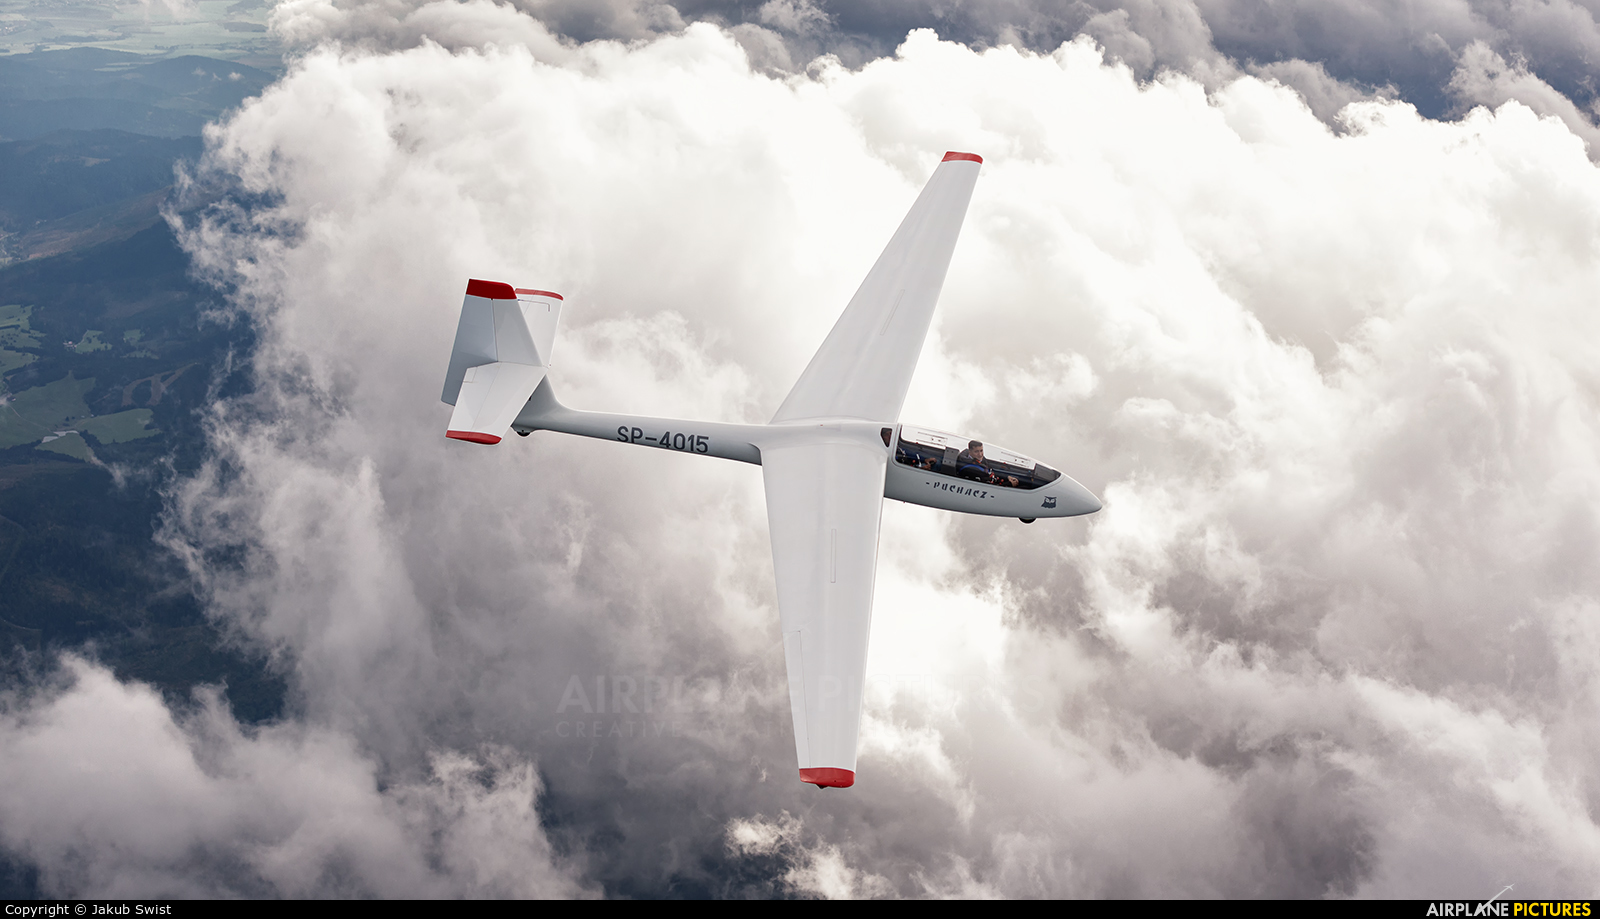 Aeroklub Nowy Targ SP-4015 aircraft at In Flight - Poland